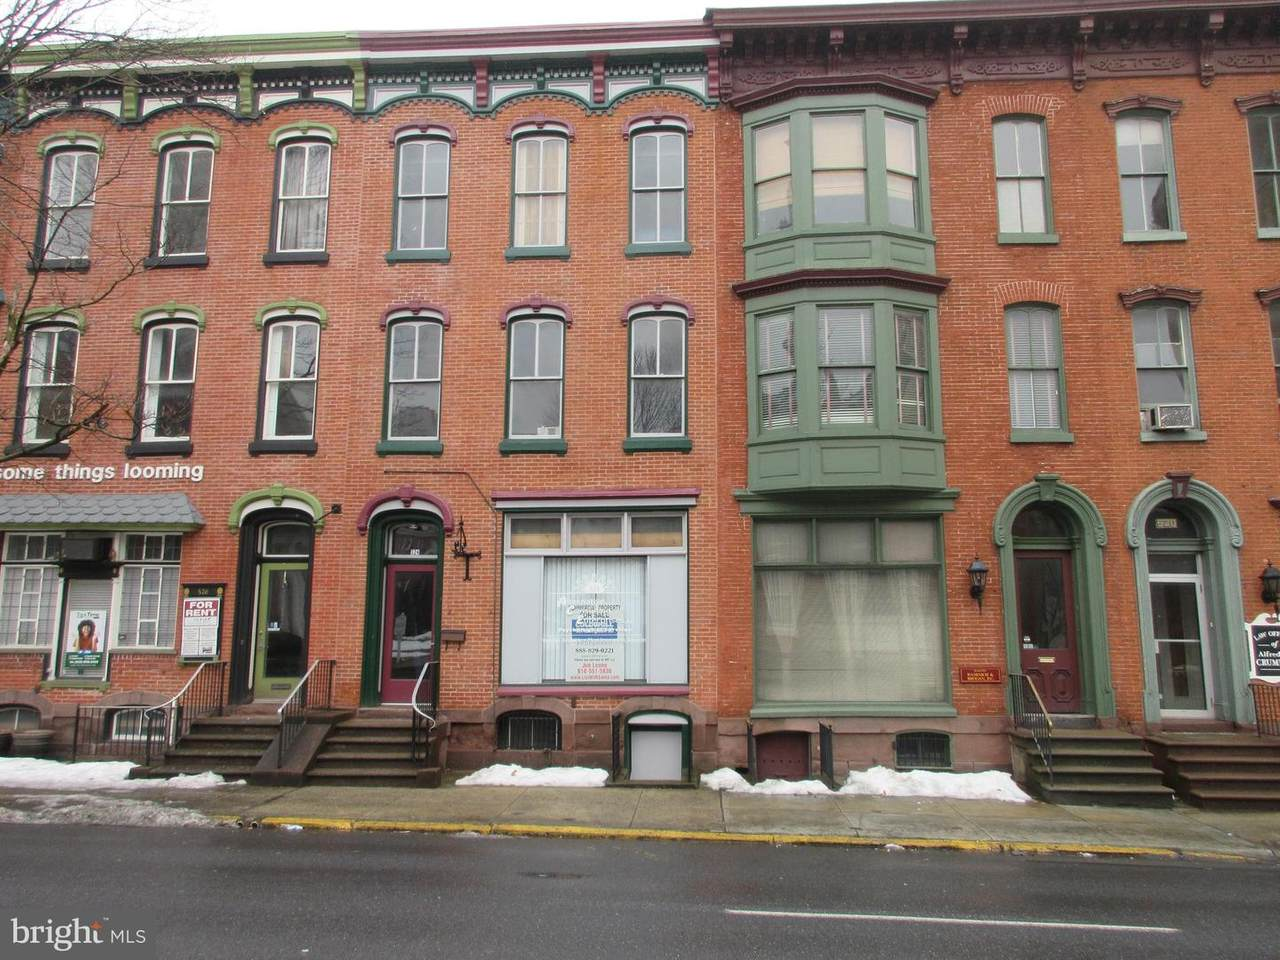 524 Washington Street - Photo 1